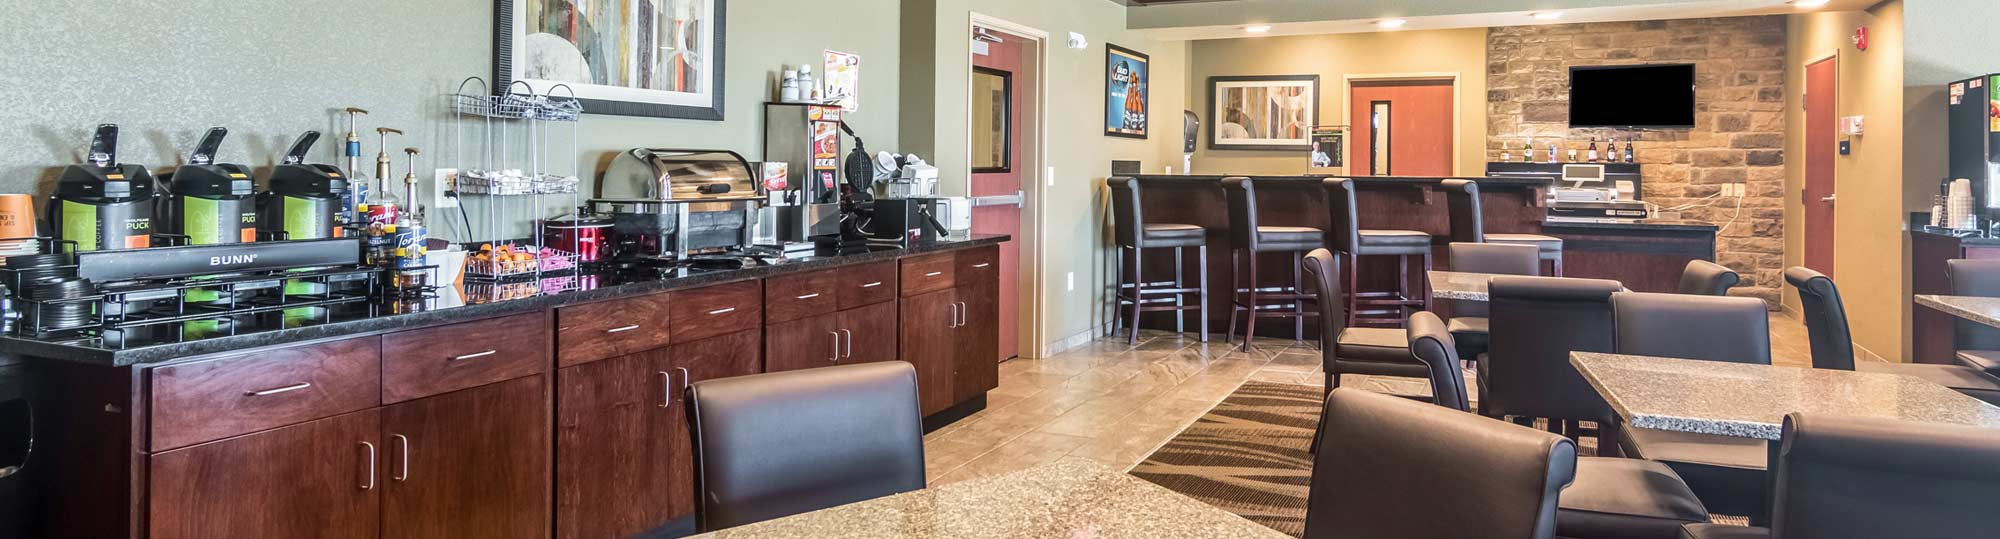 Cobblestone Inn & Suites Lakin